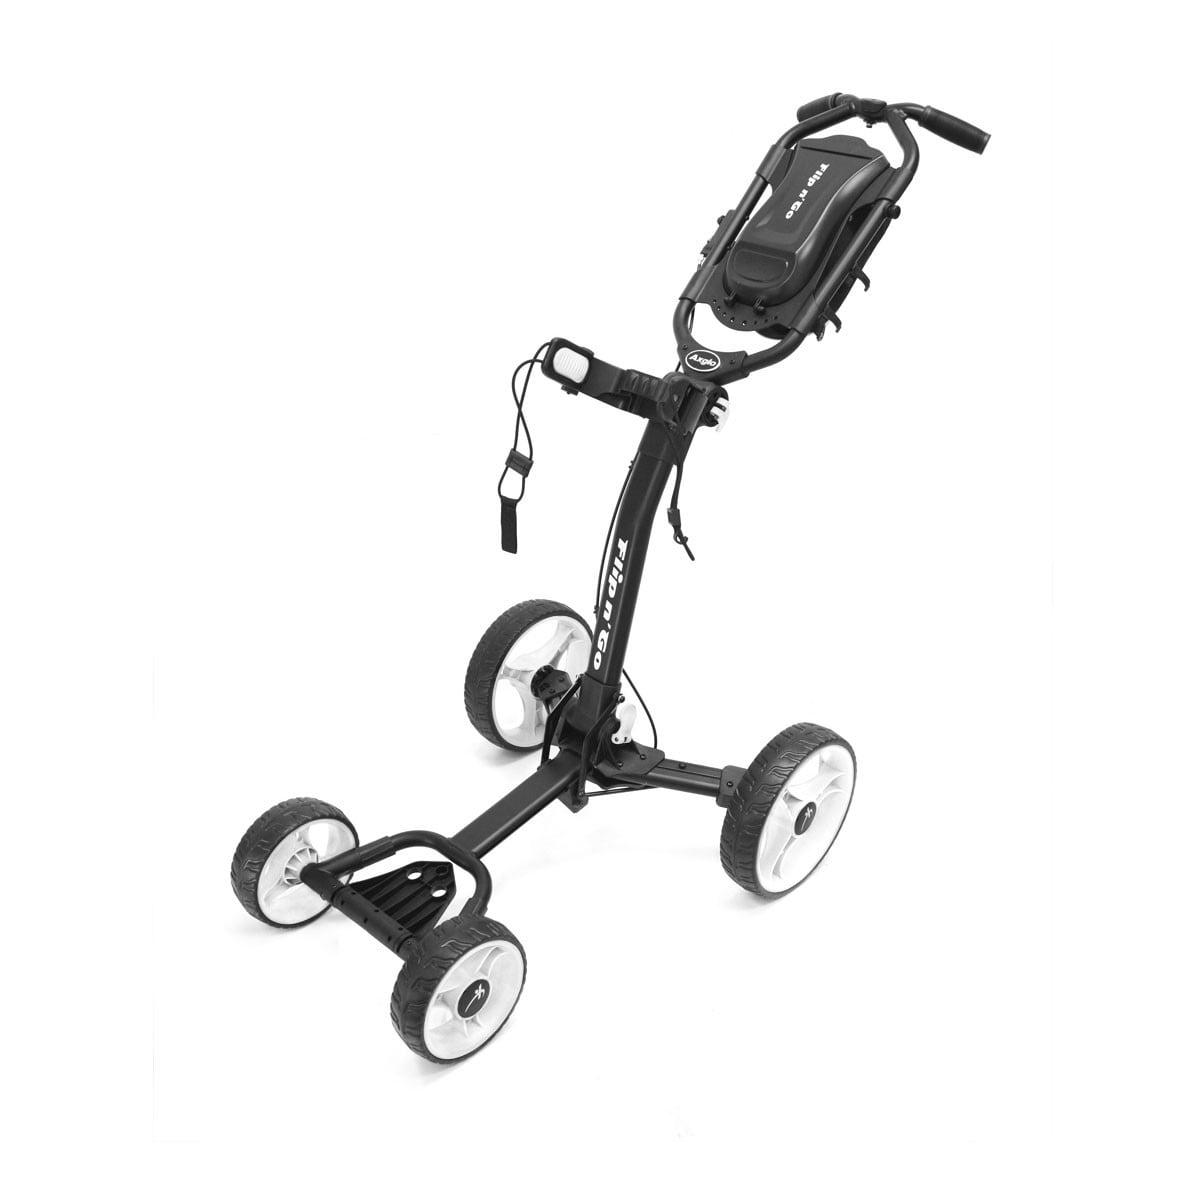 Axglo Flip N' Go 4 Wheel Cart Black/White